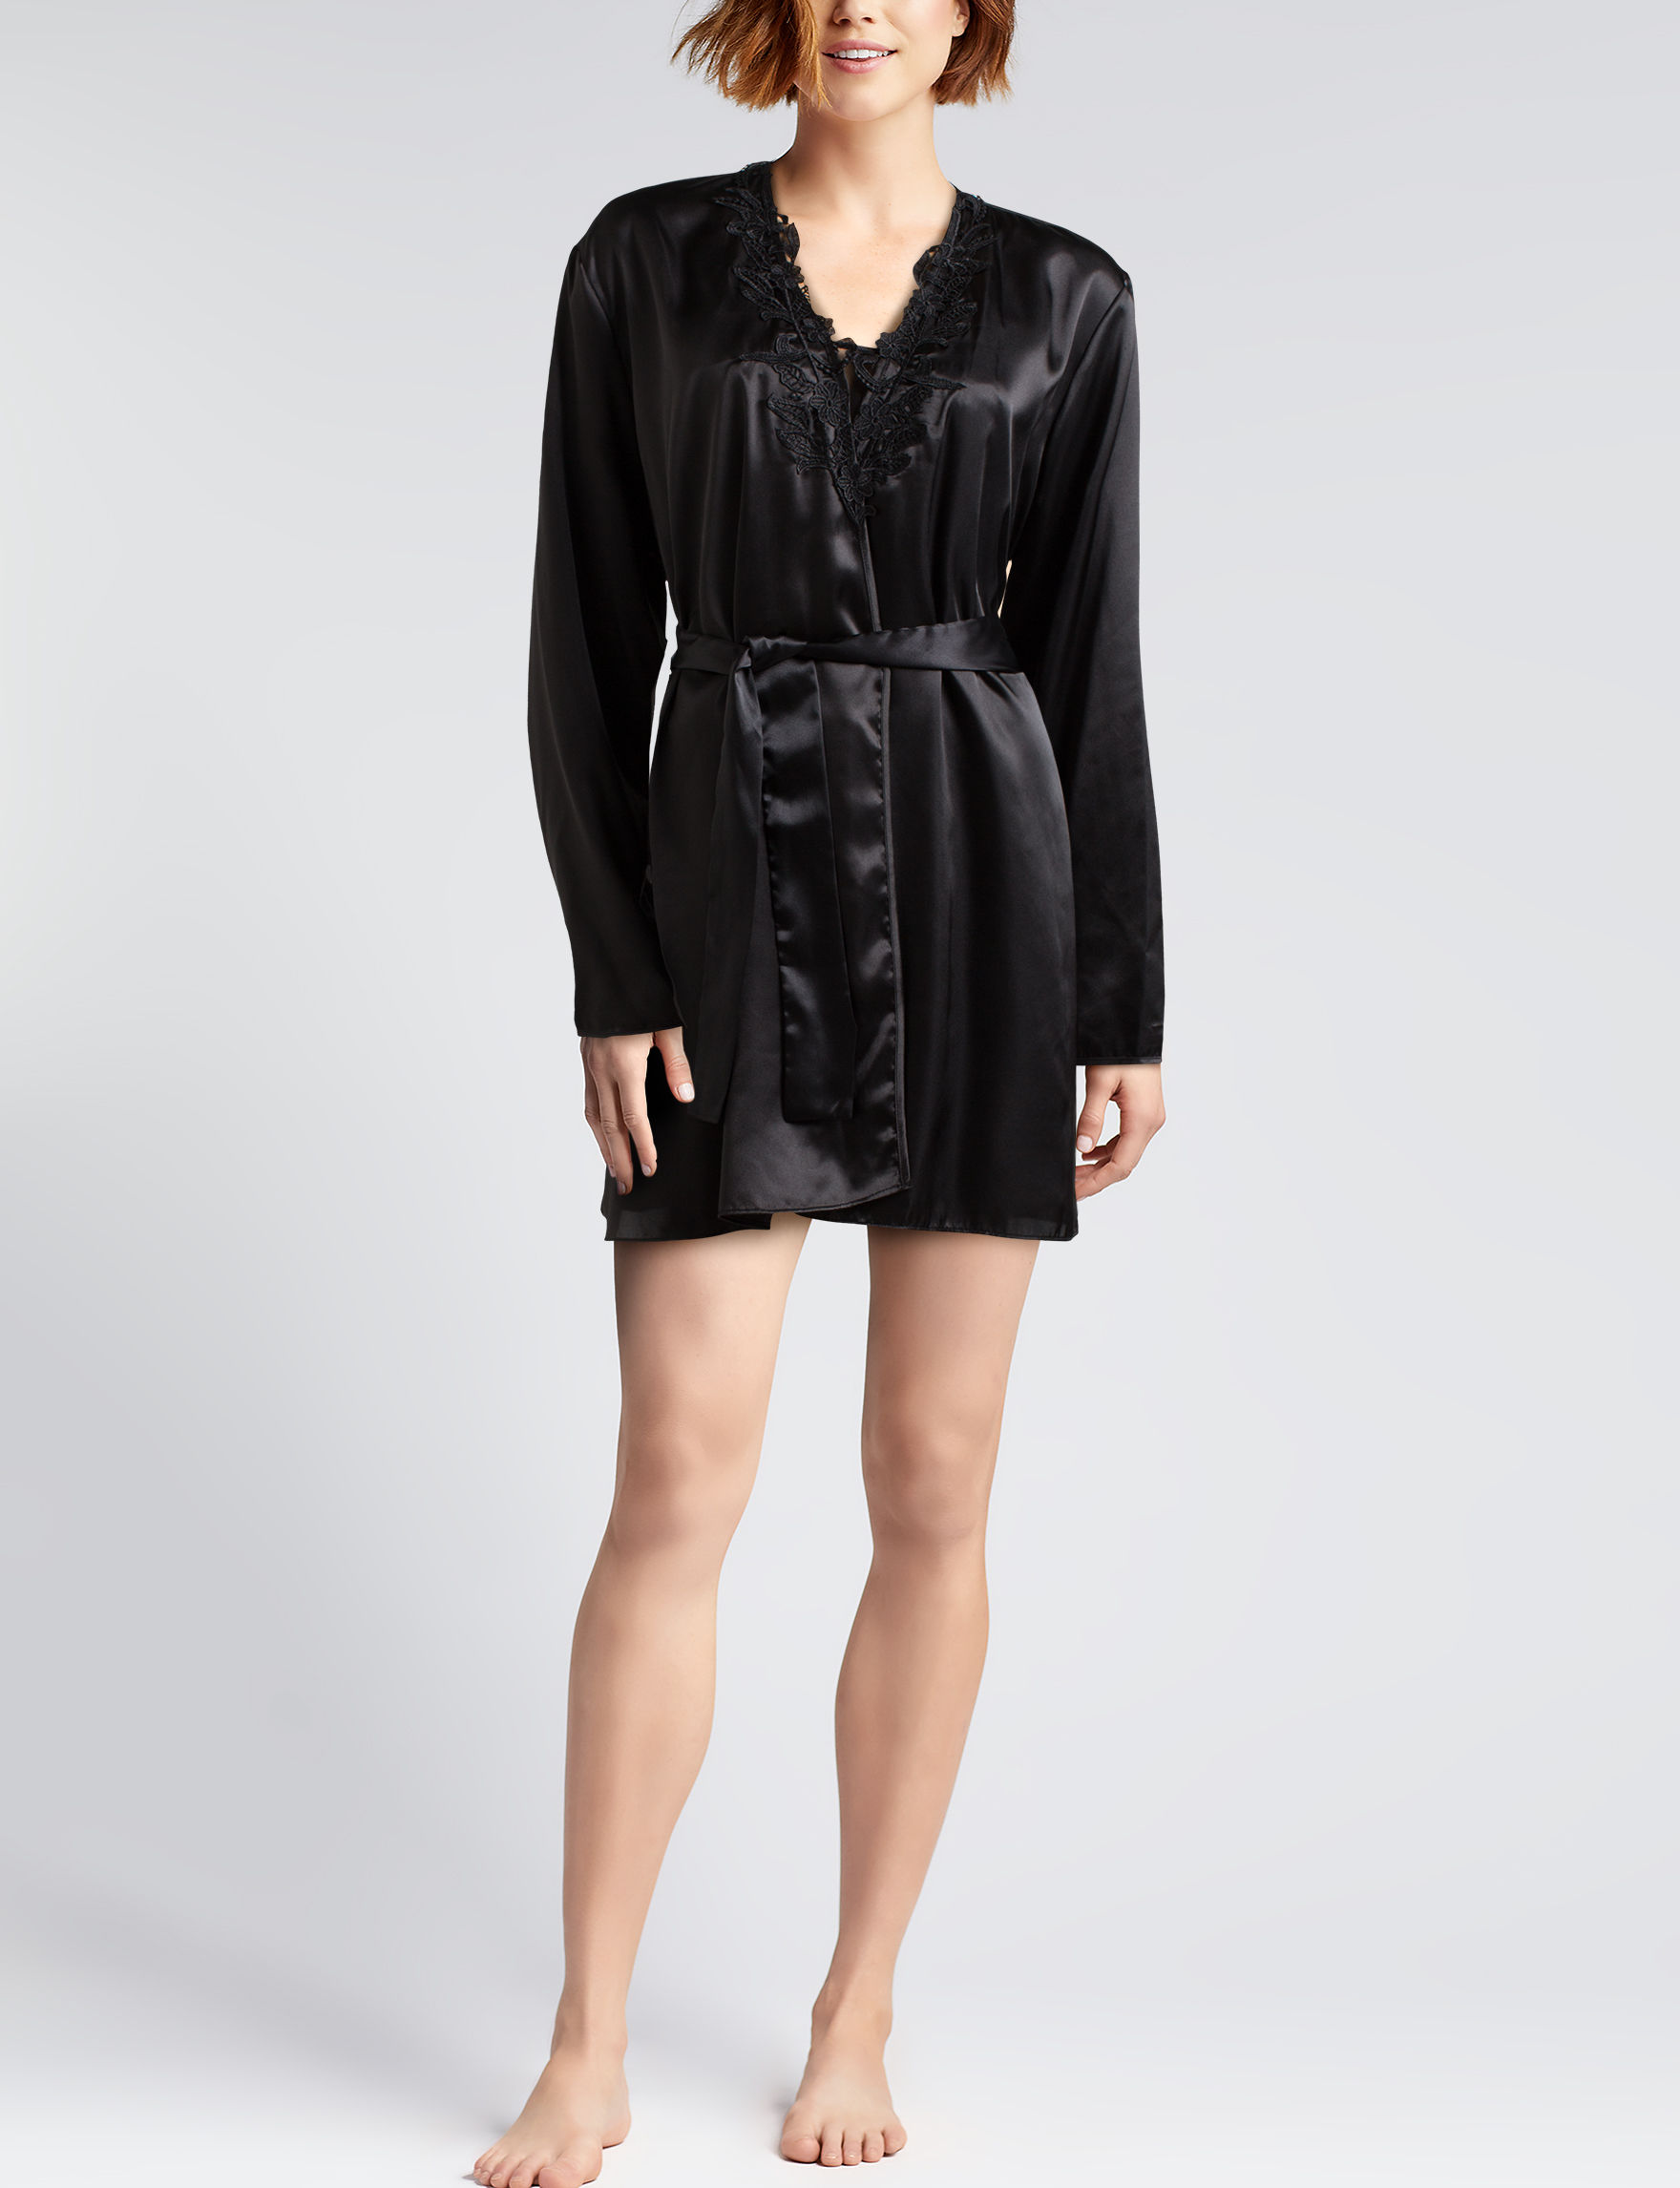 Flora Nikrooz Black Robes, Wraps & Dusters